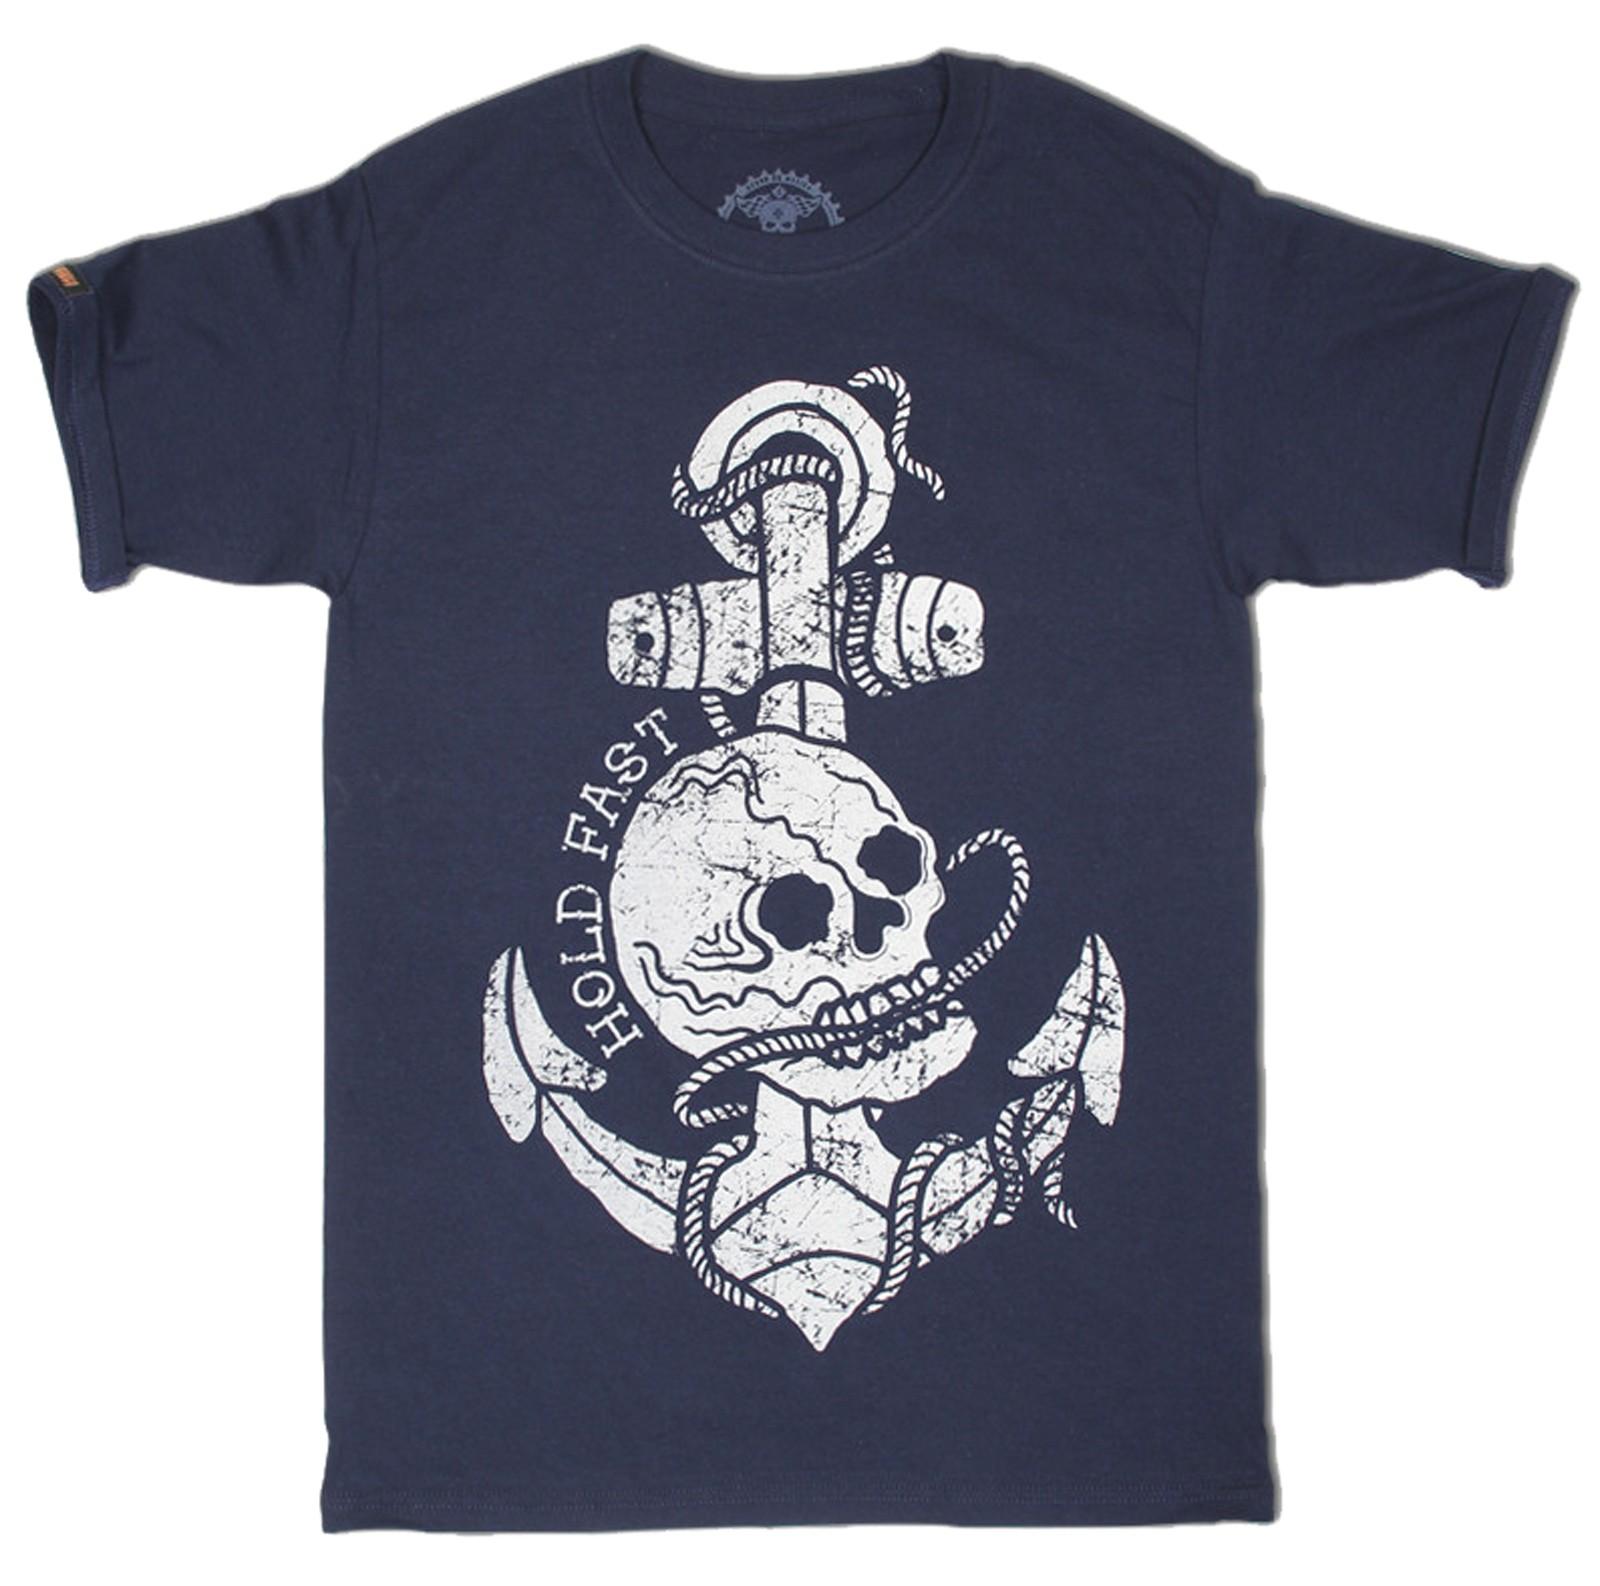 La Marca Del Diablo - Hold Fast Skull T-Shirt Front